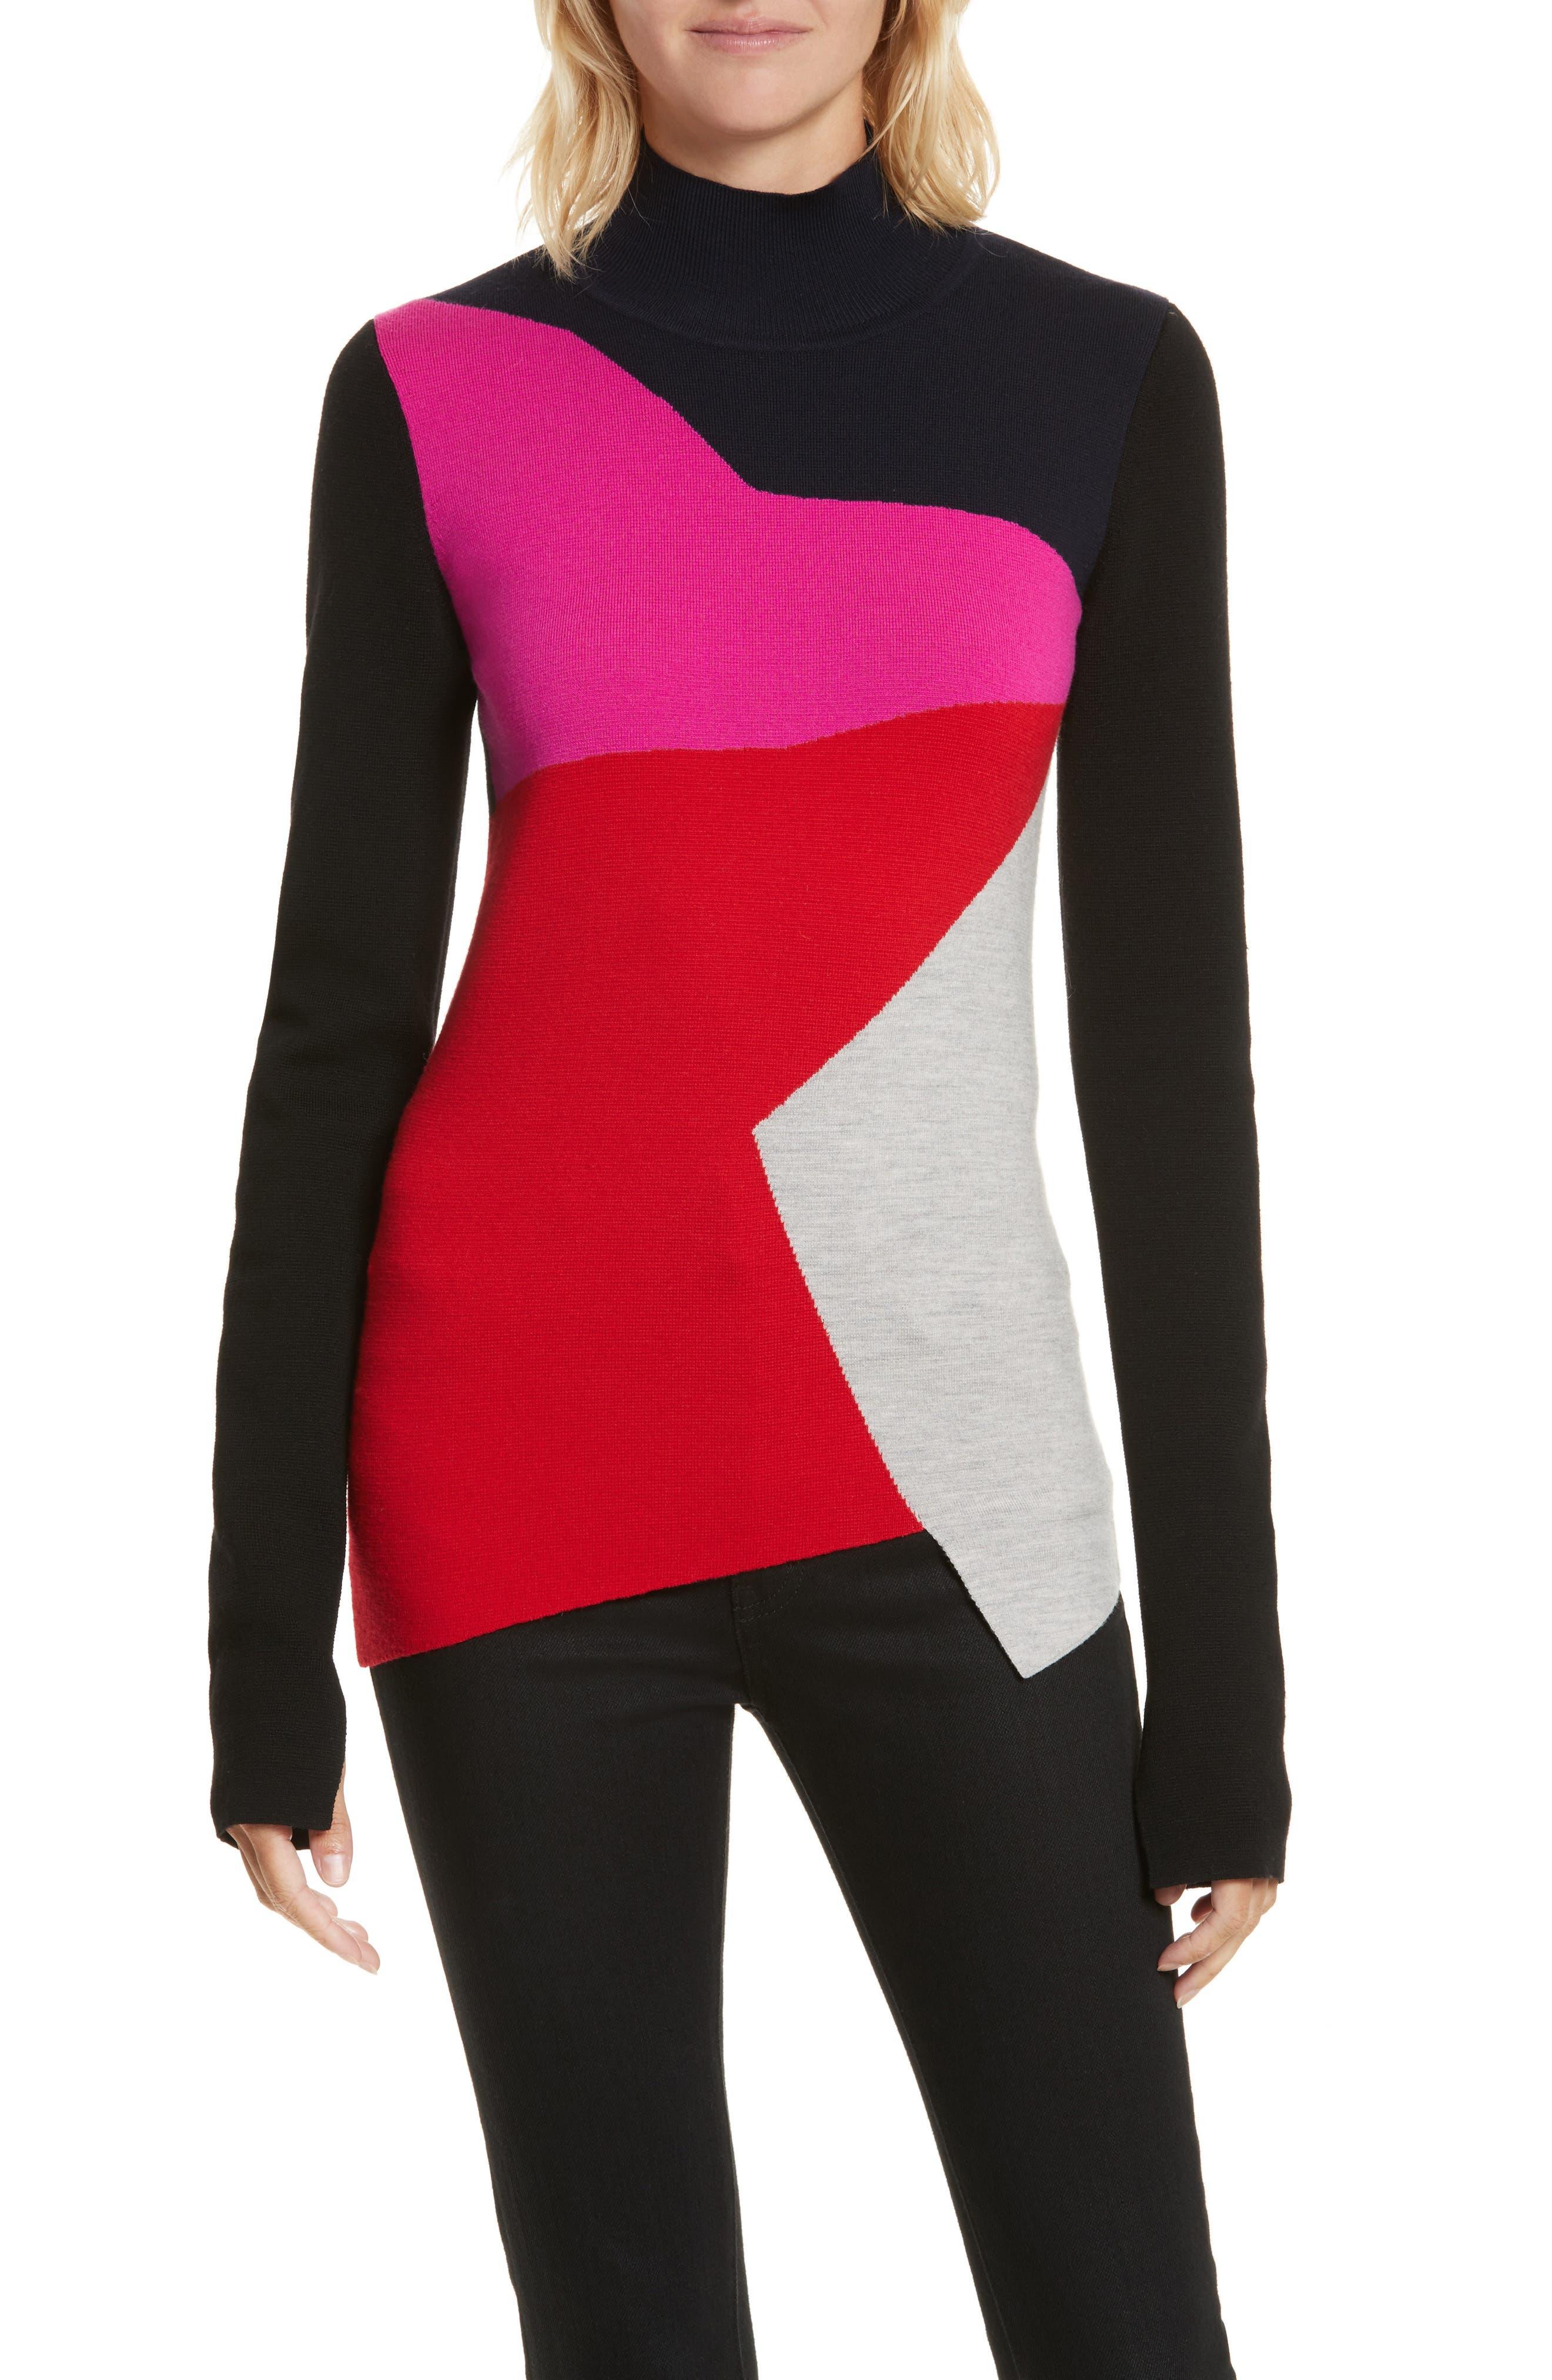 Diane von Furstenberg Colorblock Turtleneck Pullover,                             Main thumbnail 1, color,                             642